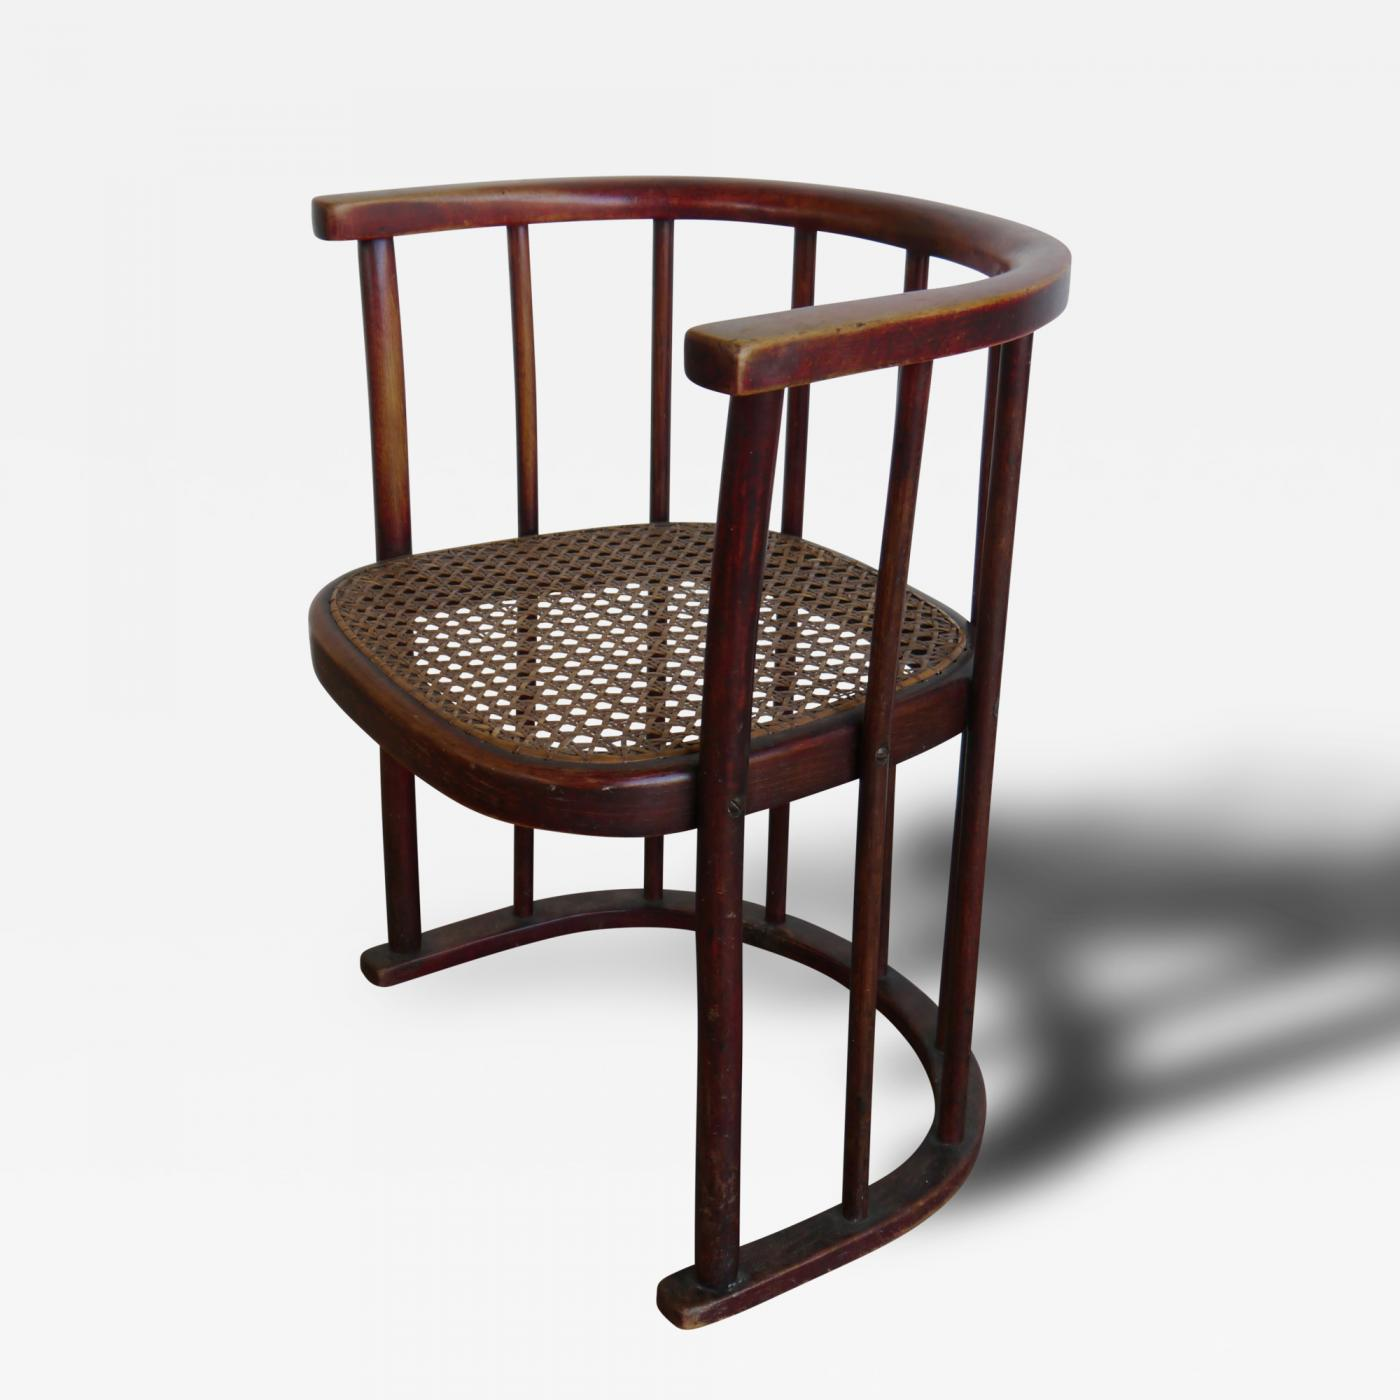 Wonderful Listings / Furniture / Seating / Armchairs